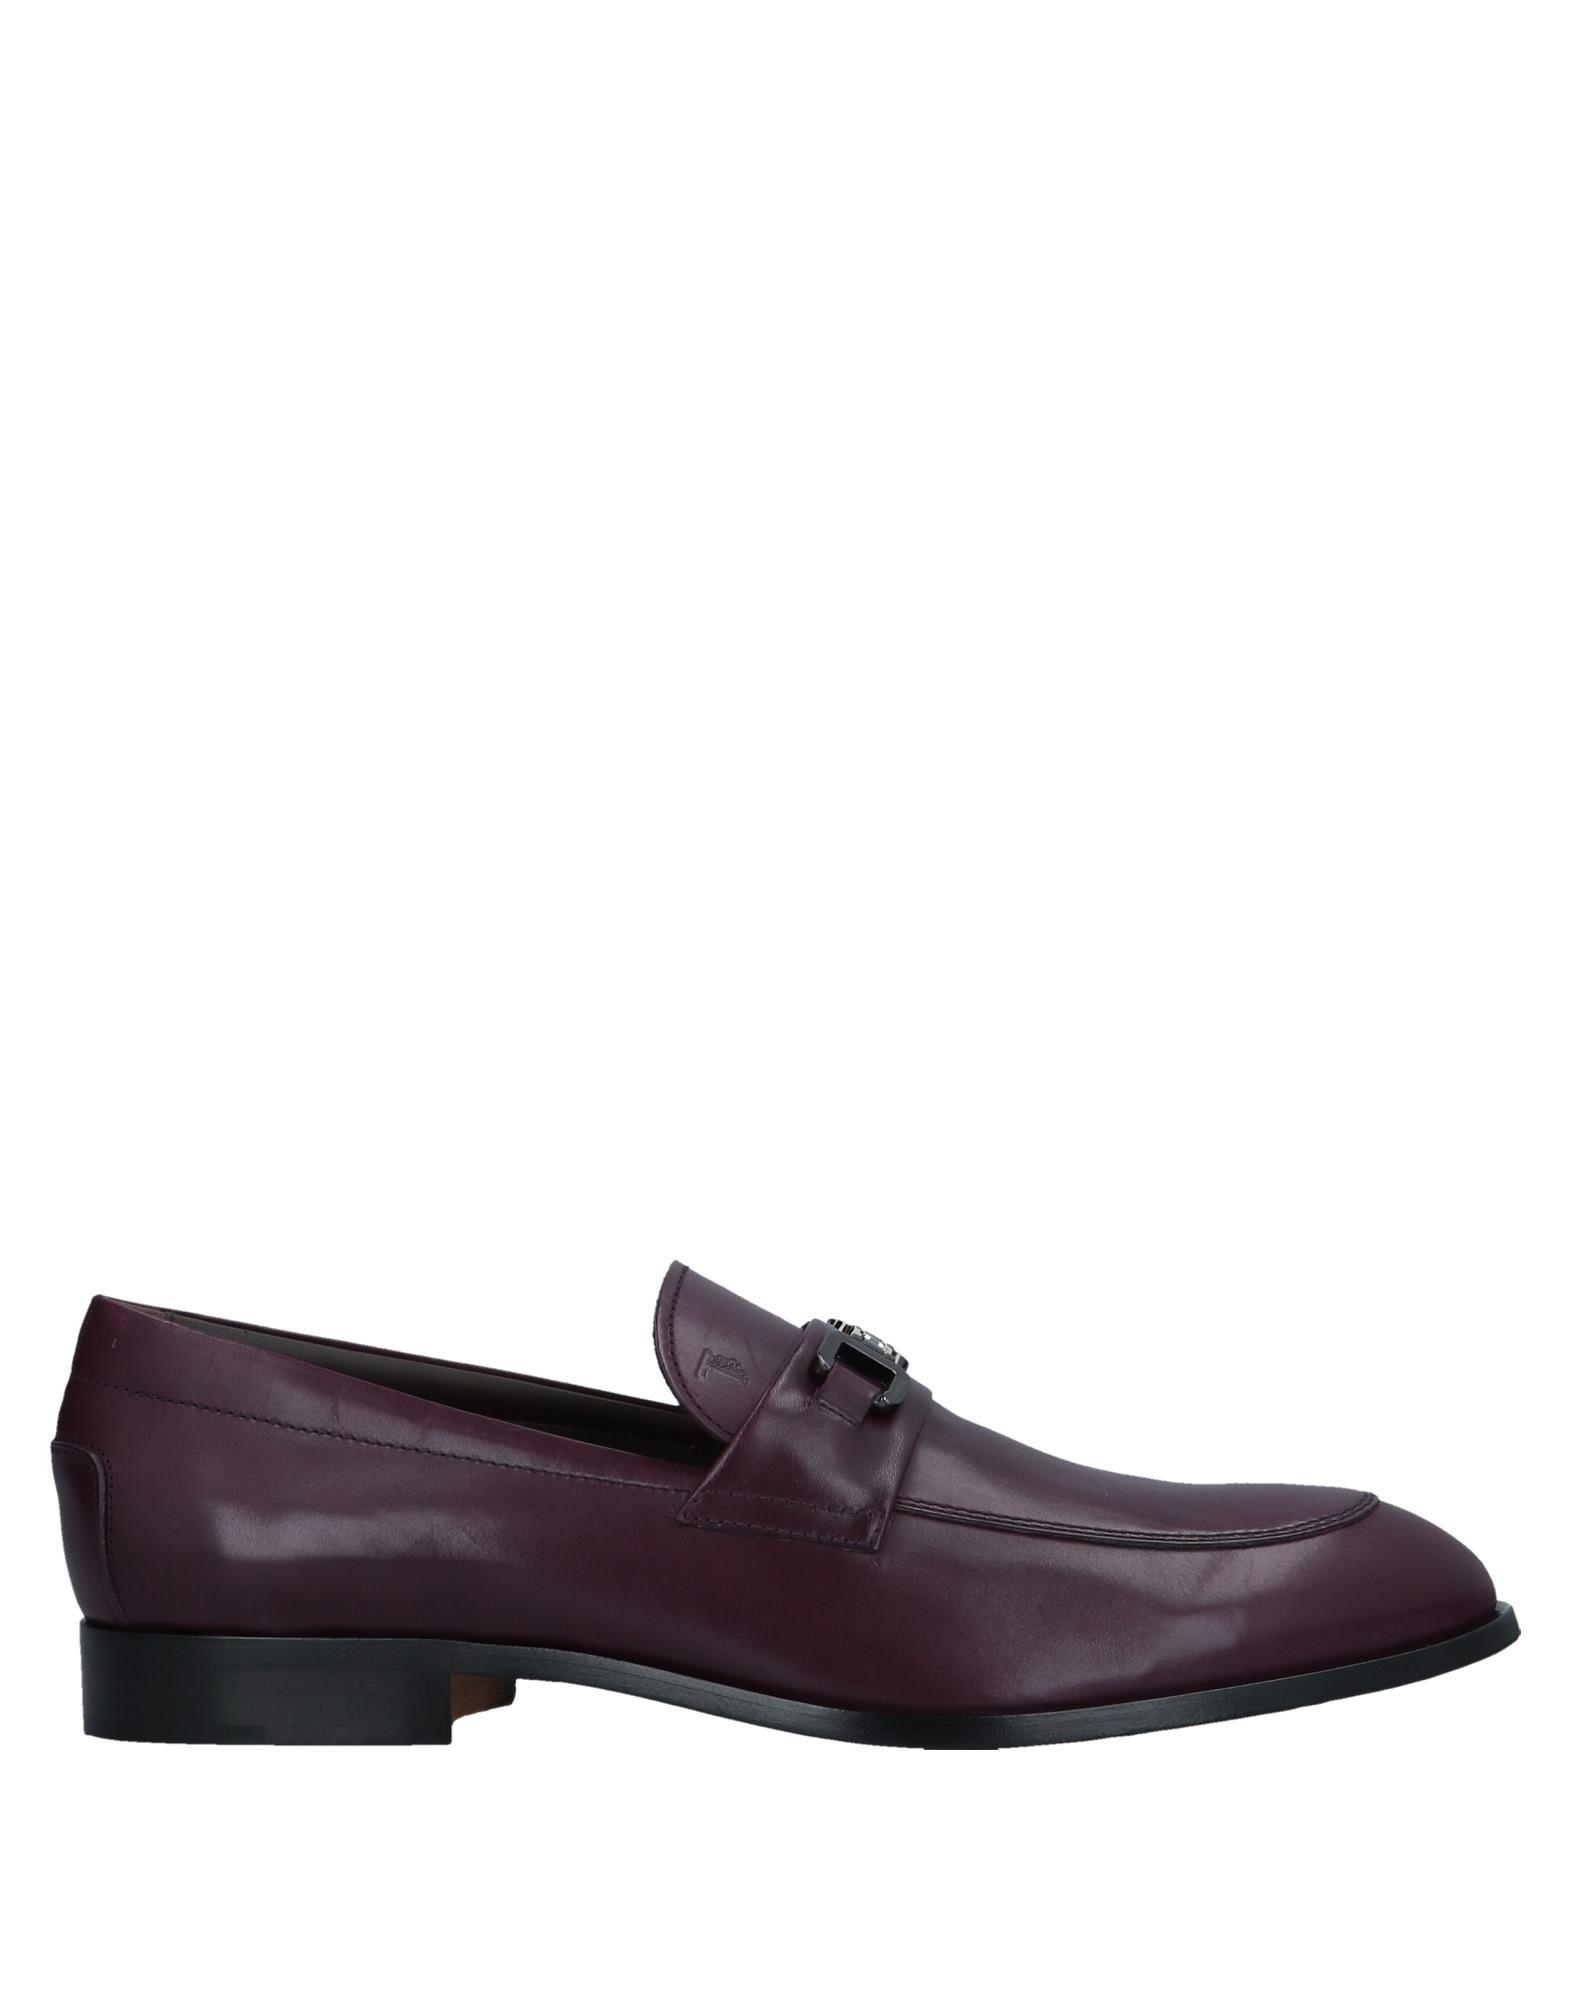 Tod's Mokassins Herren beliebte  11540667IF Gute Qualität beliebte Herren Schuhe 99f45a